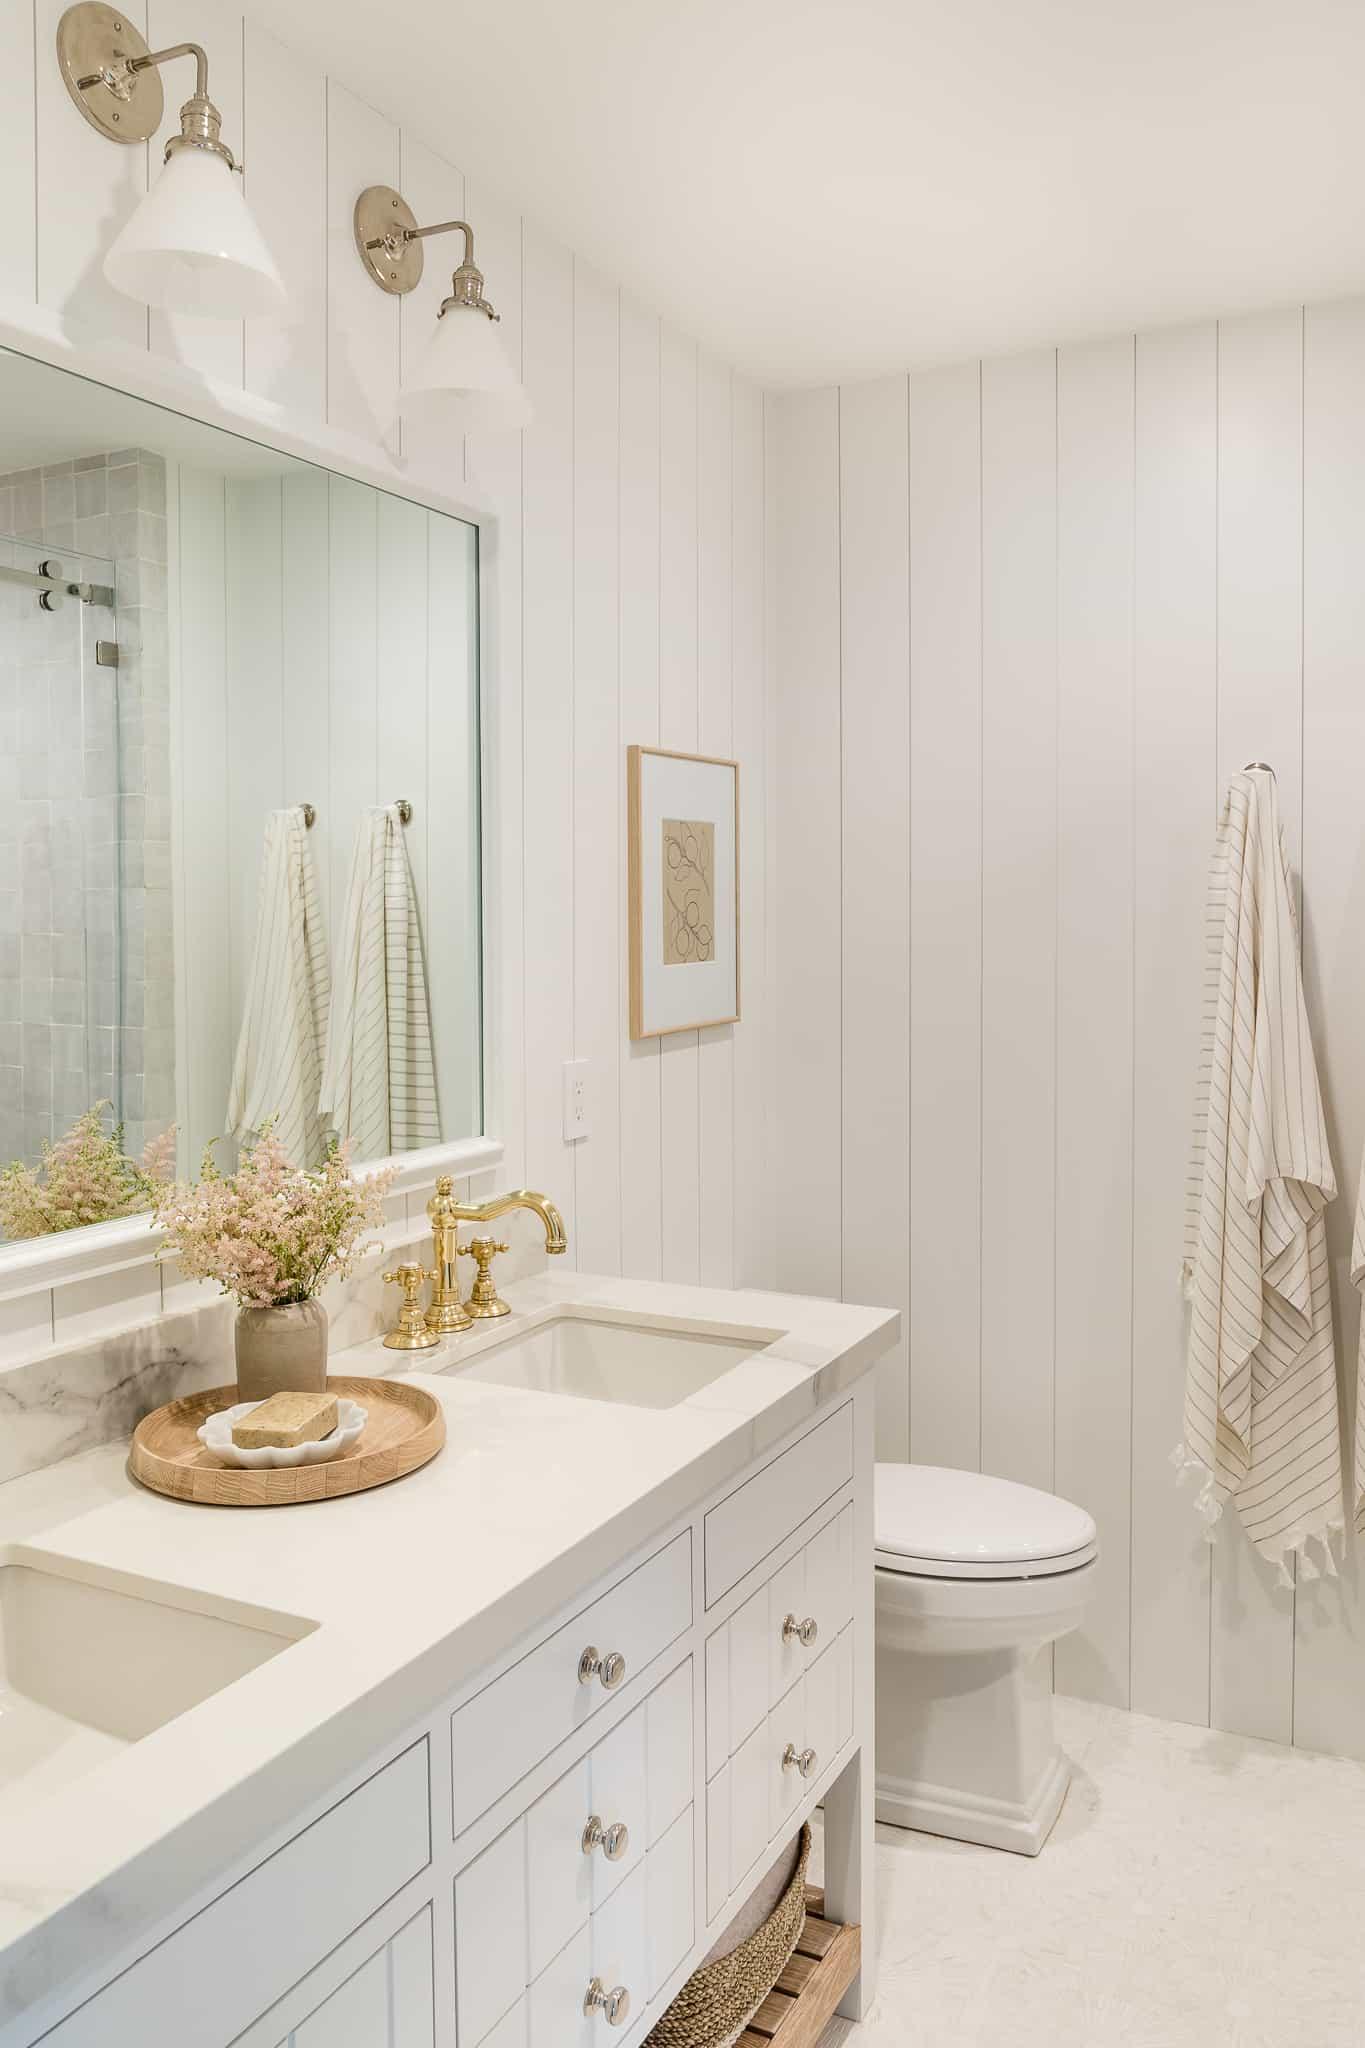 Coastal Bathroom Design - Port Newport Project - Mindy Gayer Design Co.